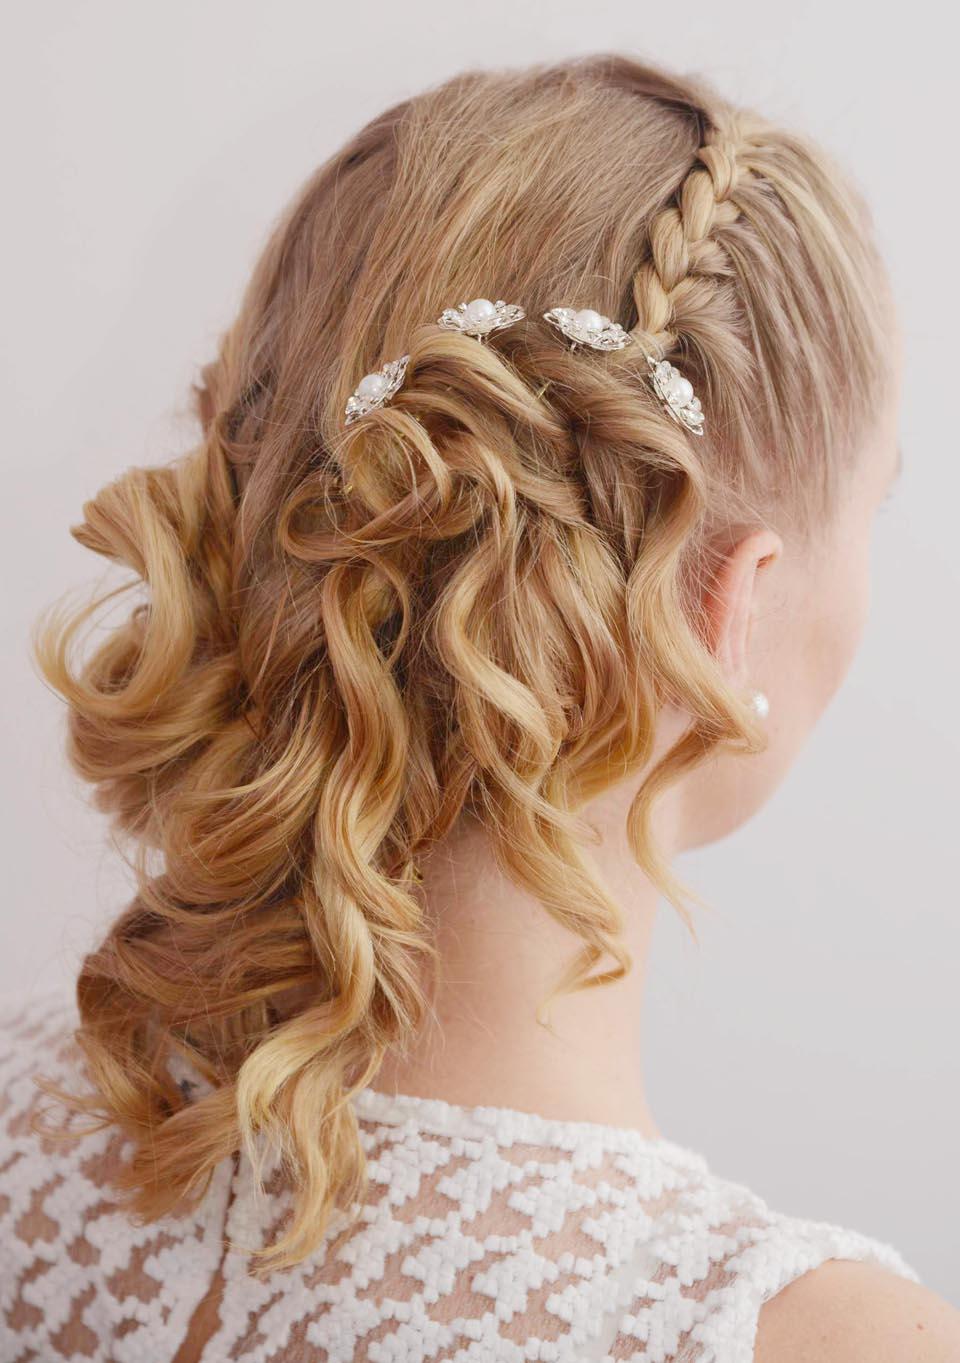 Braiding-Bar-Berkshire-Branding-Adult-Braided-Hair